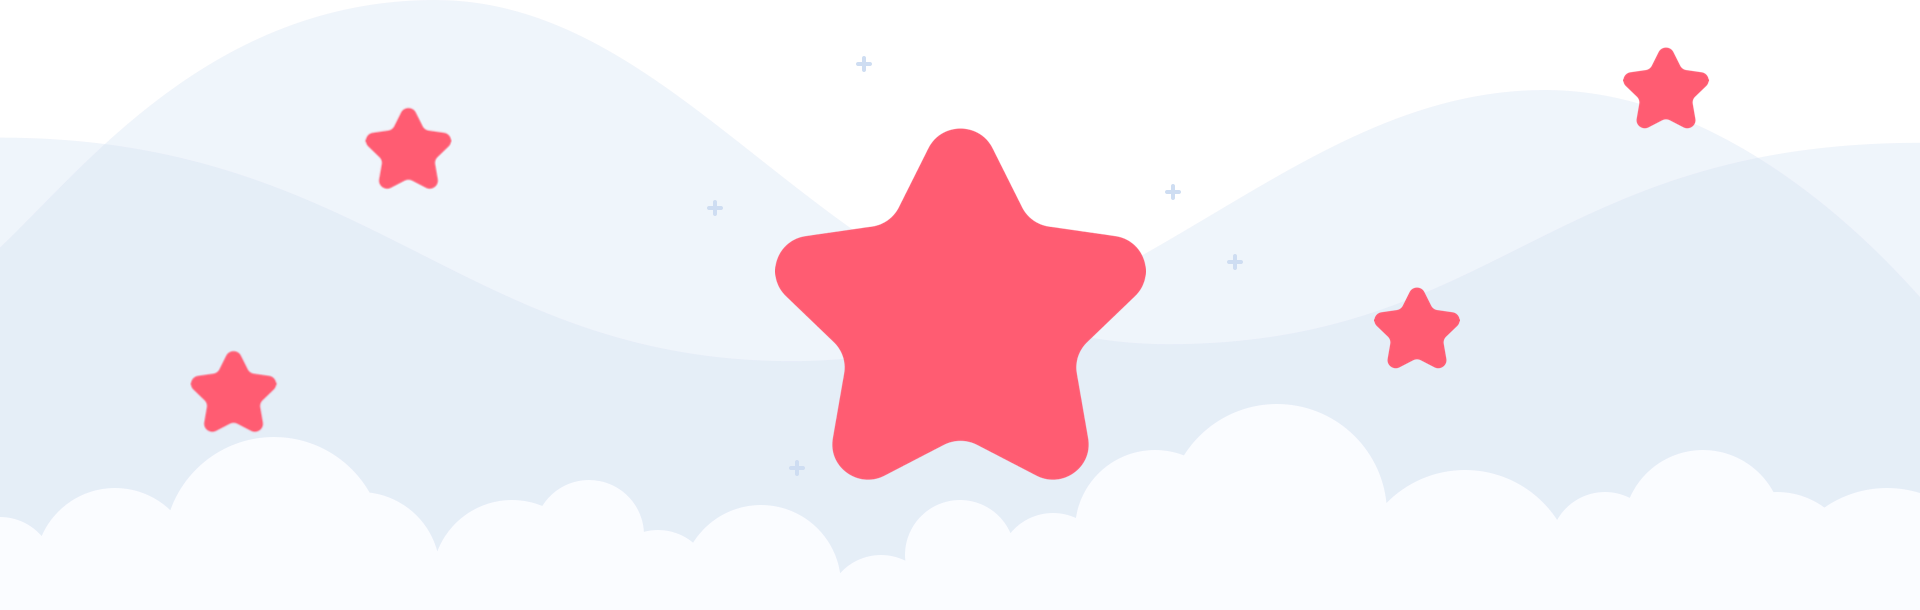 Presence Stars